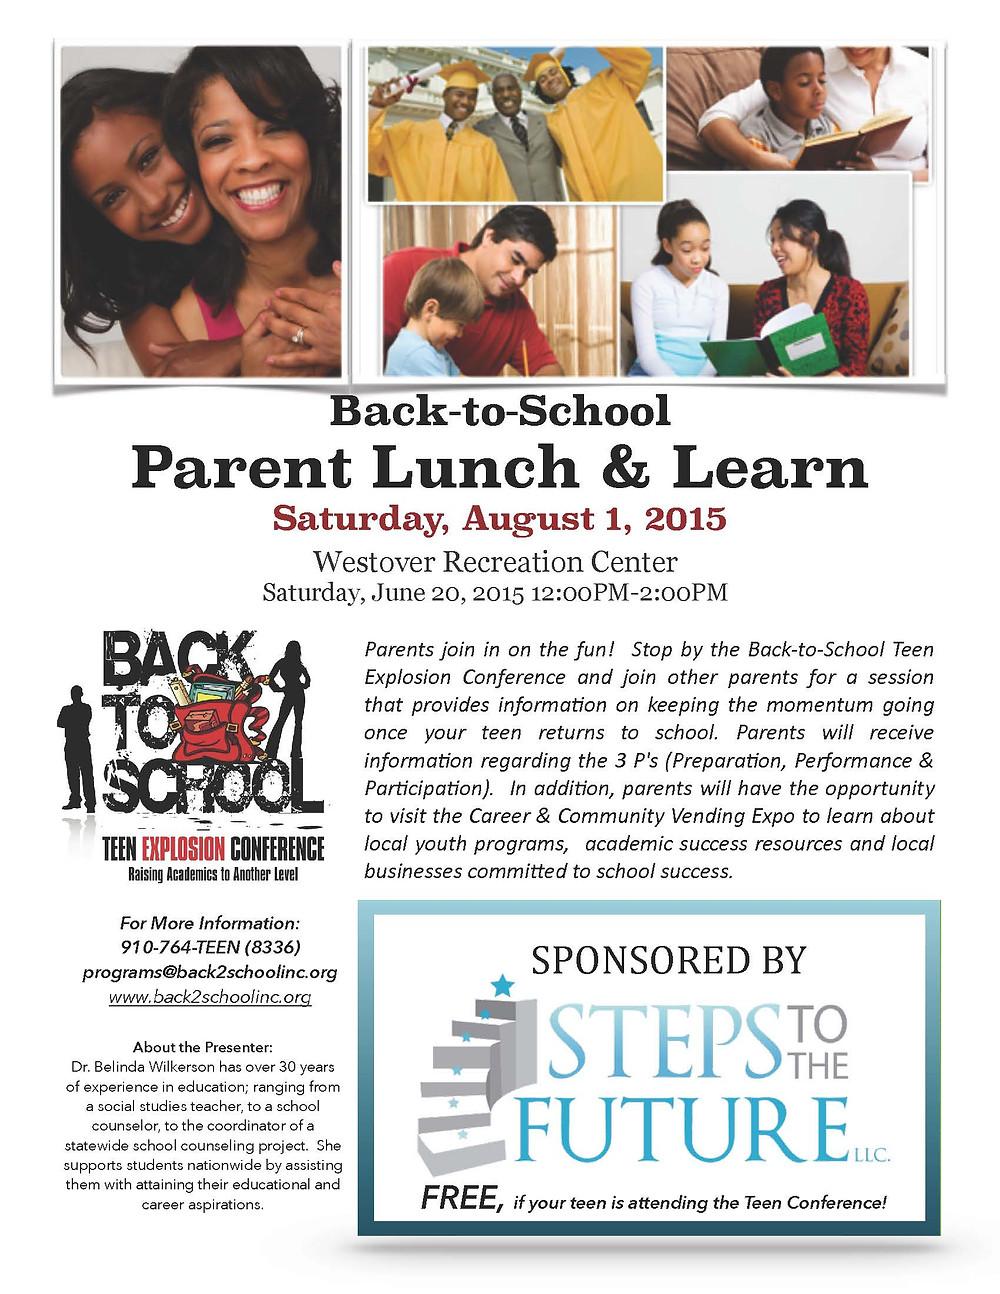 Parent Lunch & Learn Flyer FINAL.jpg